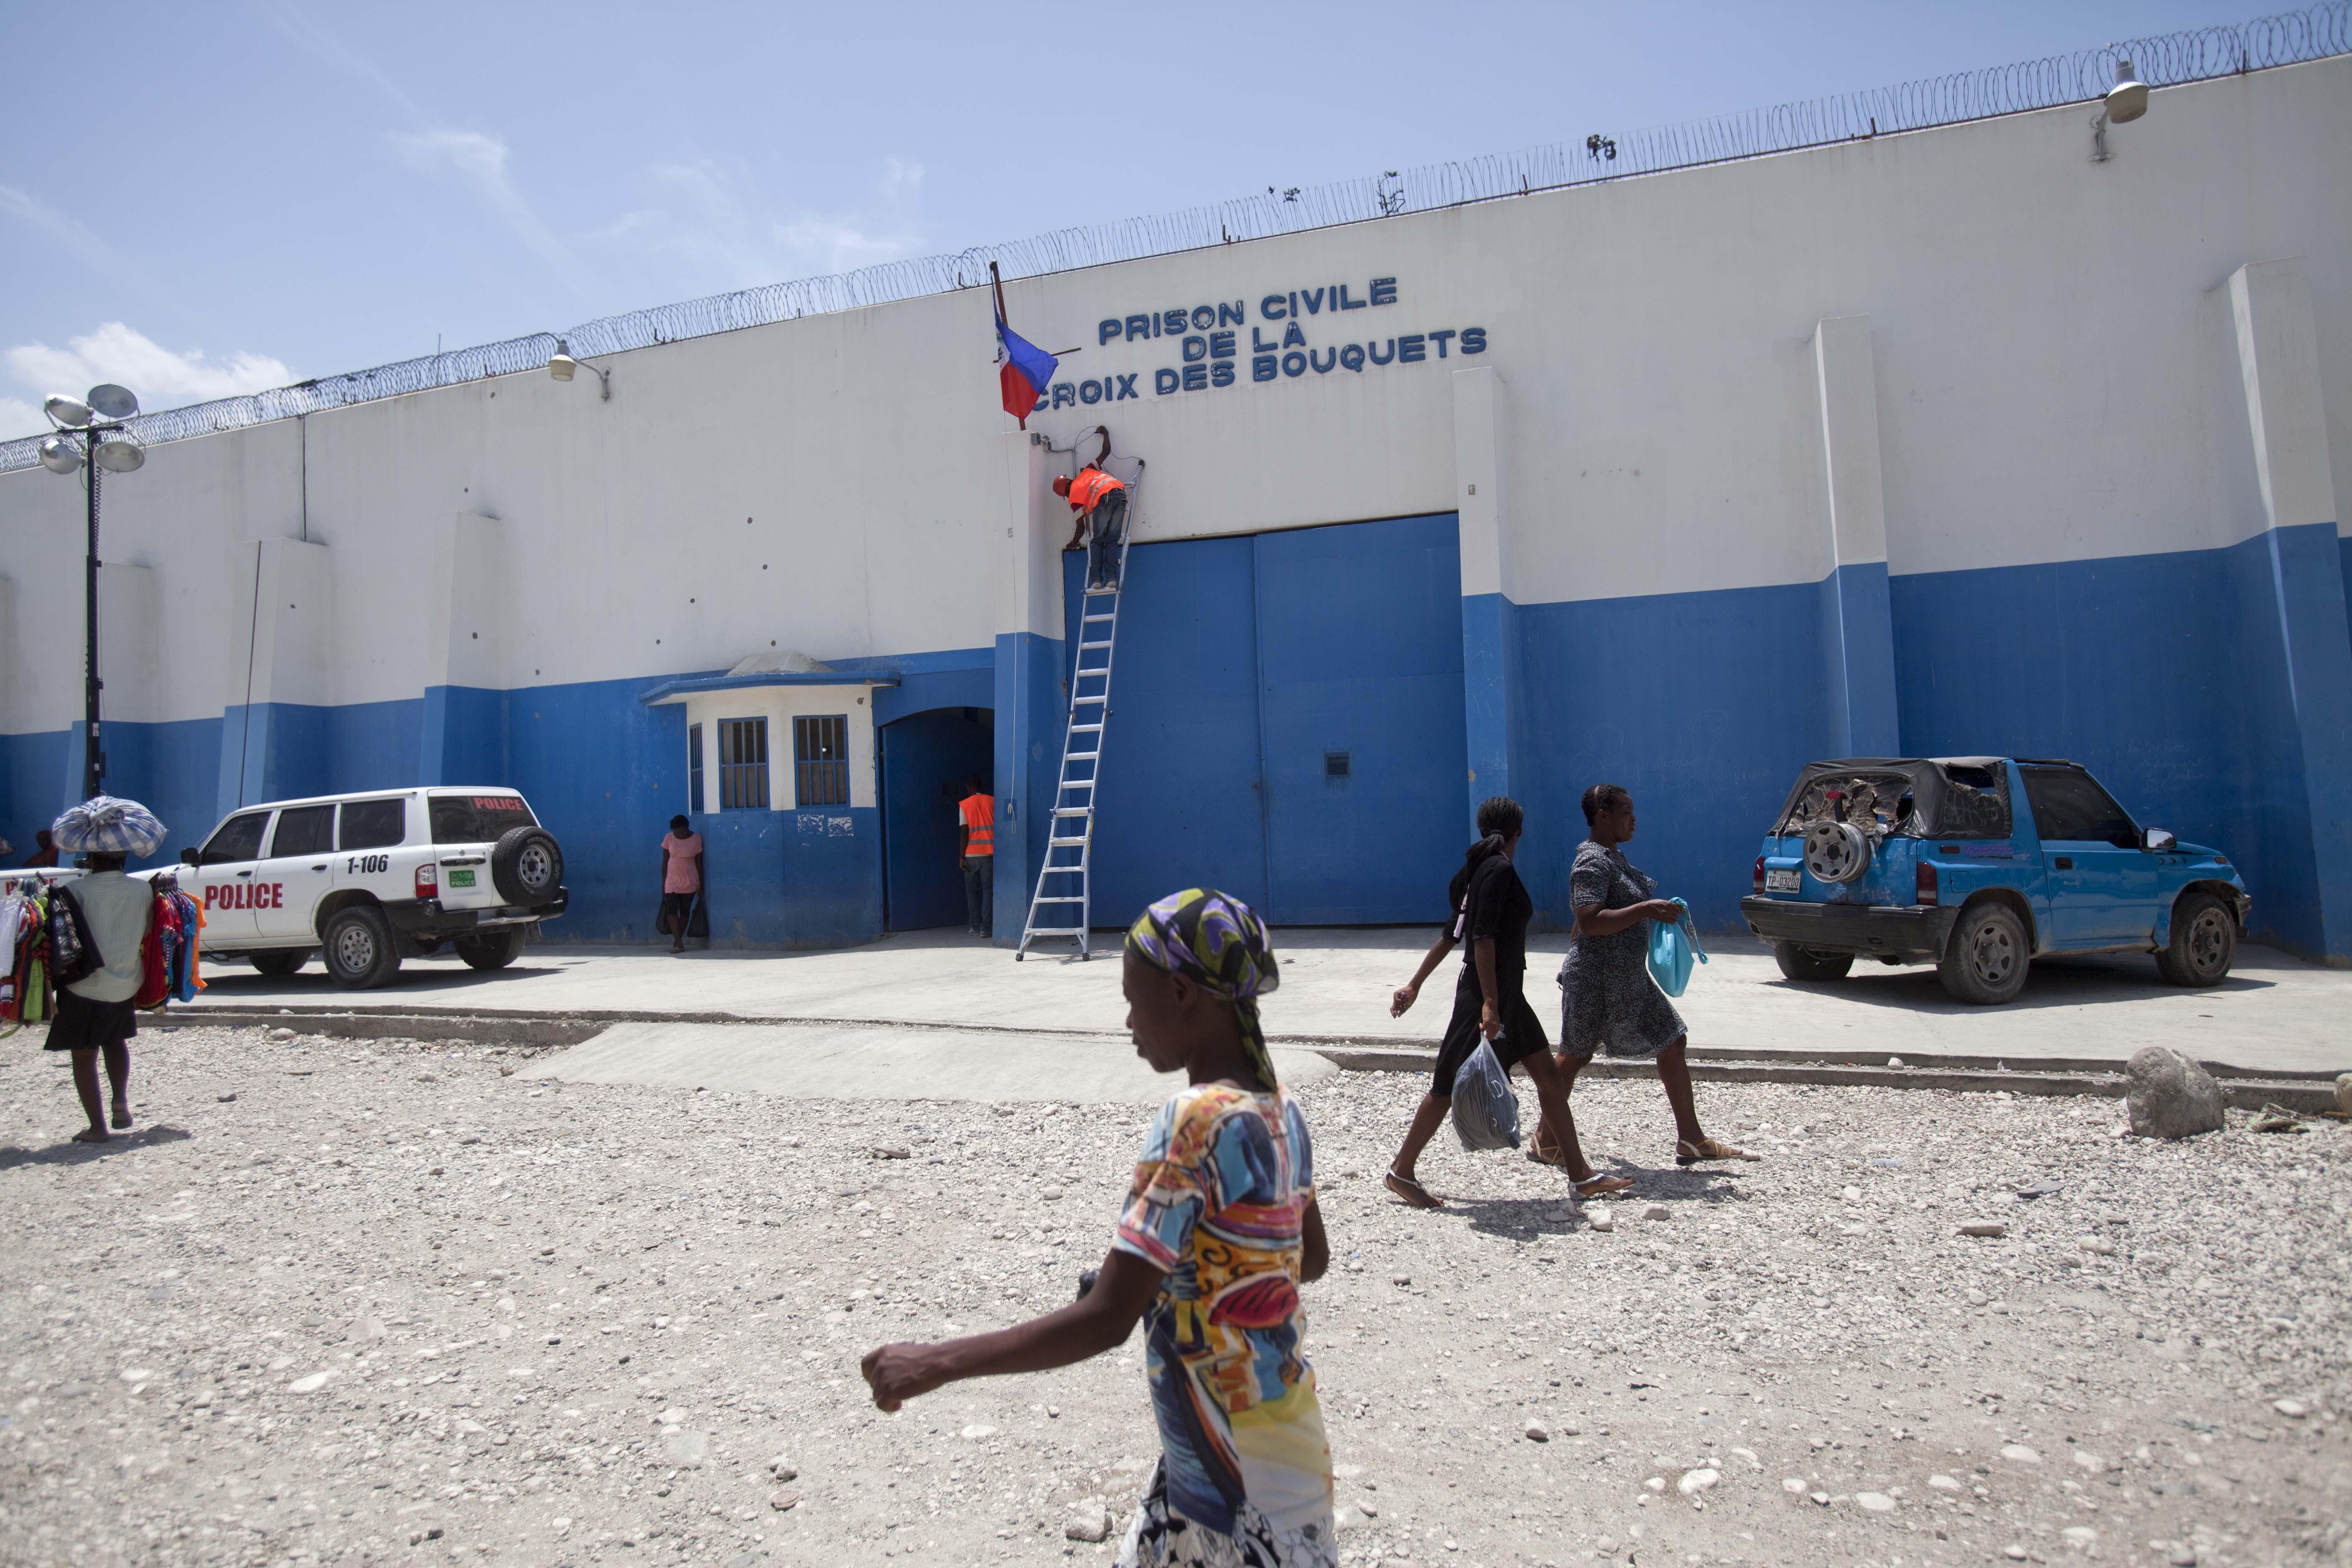 Haiti Prisons Under Scrutiny After Mass Breakout